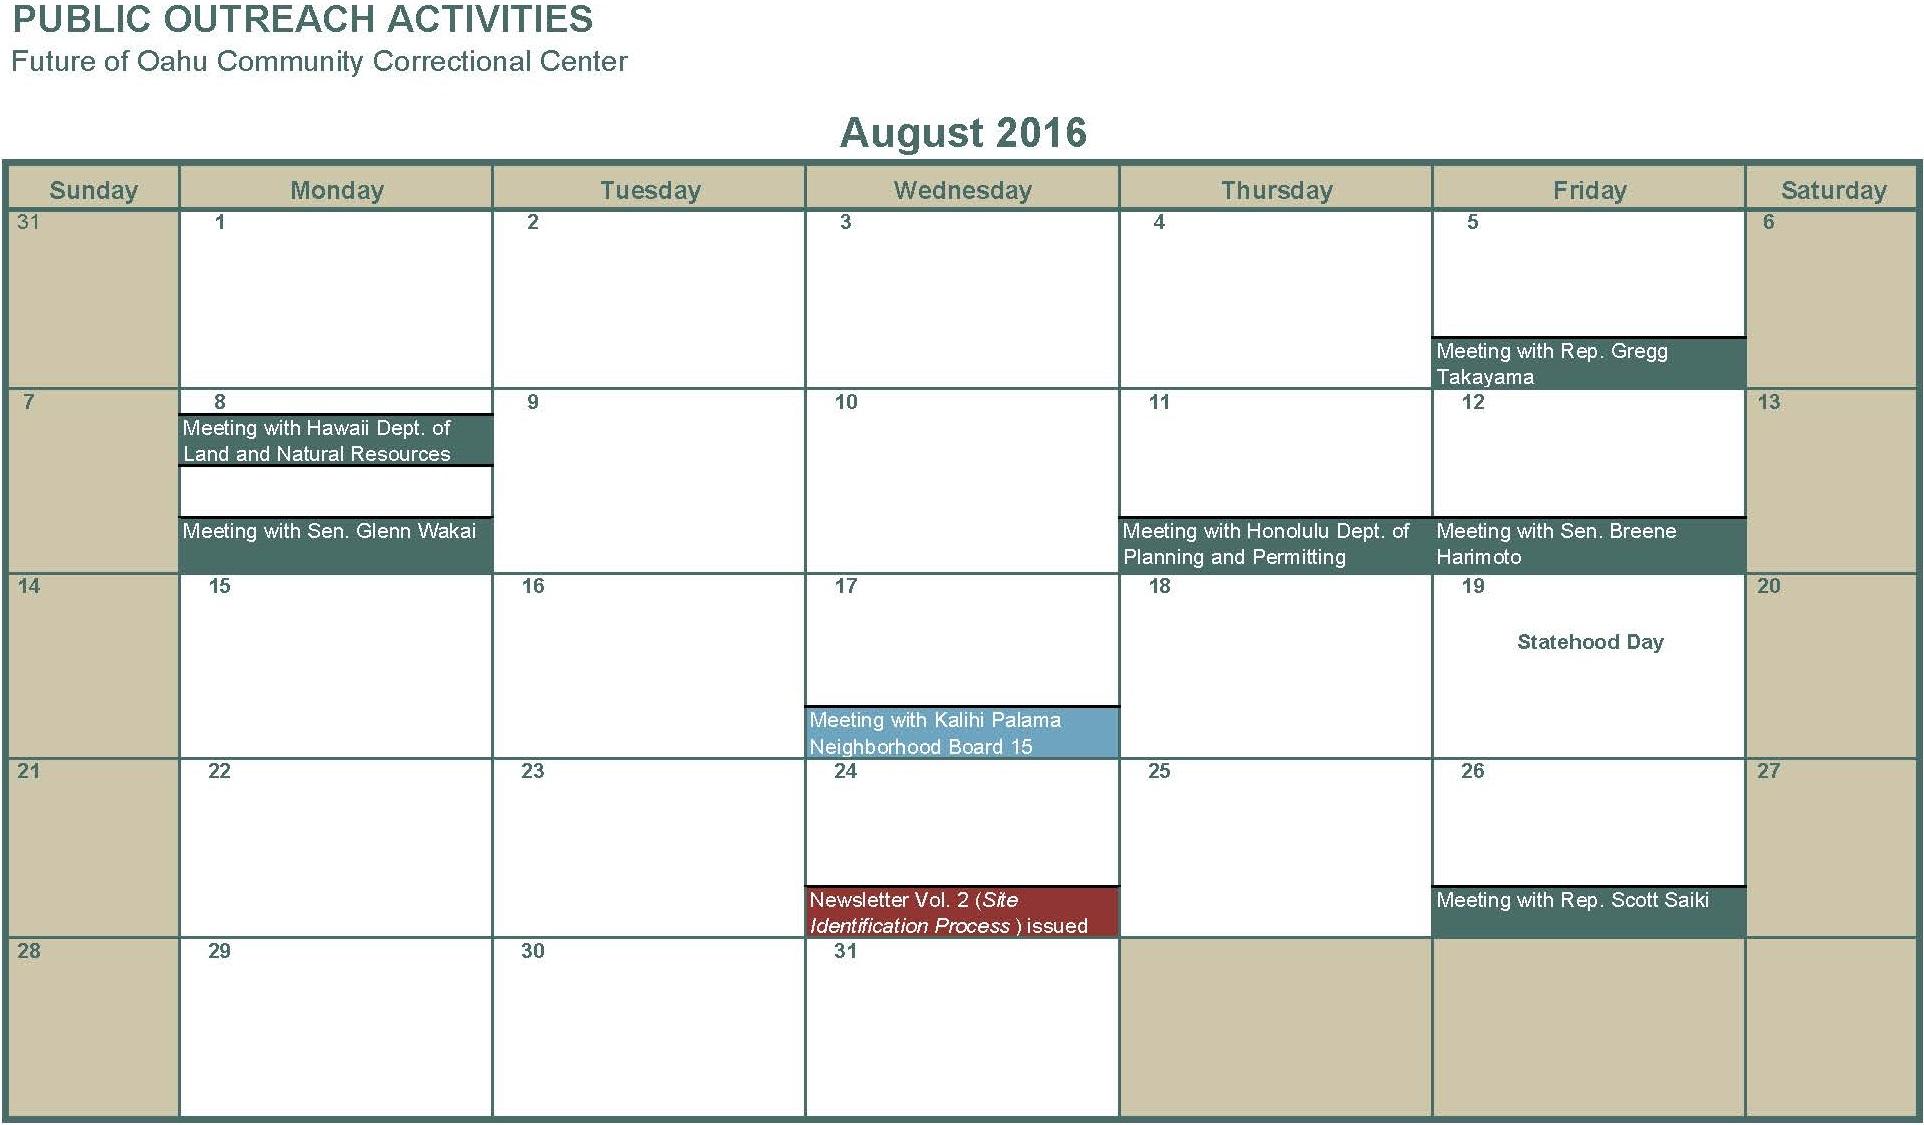 August 2016 Meetings attended